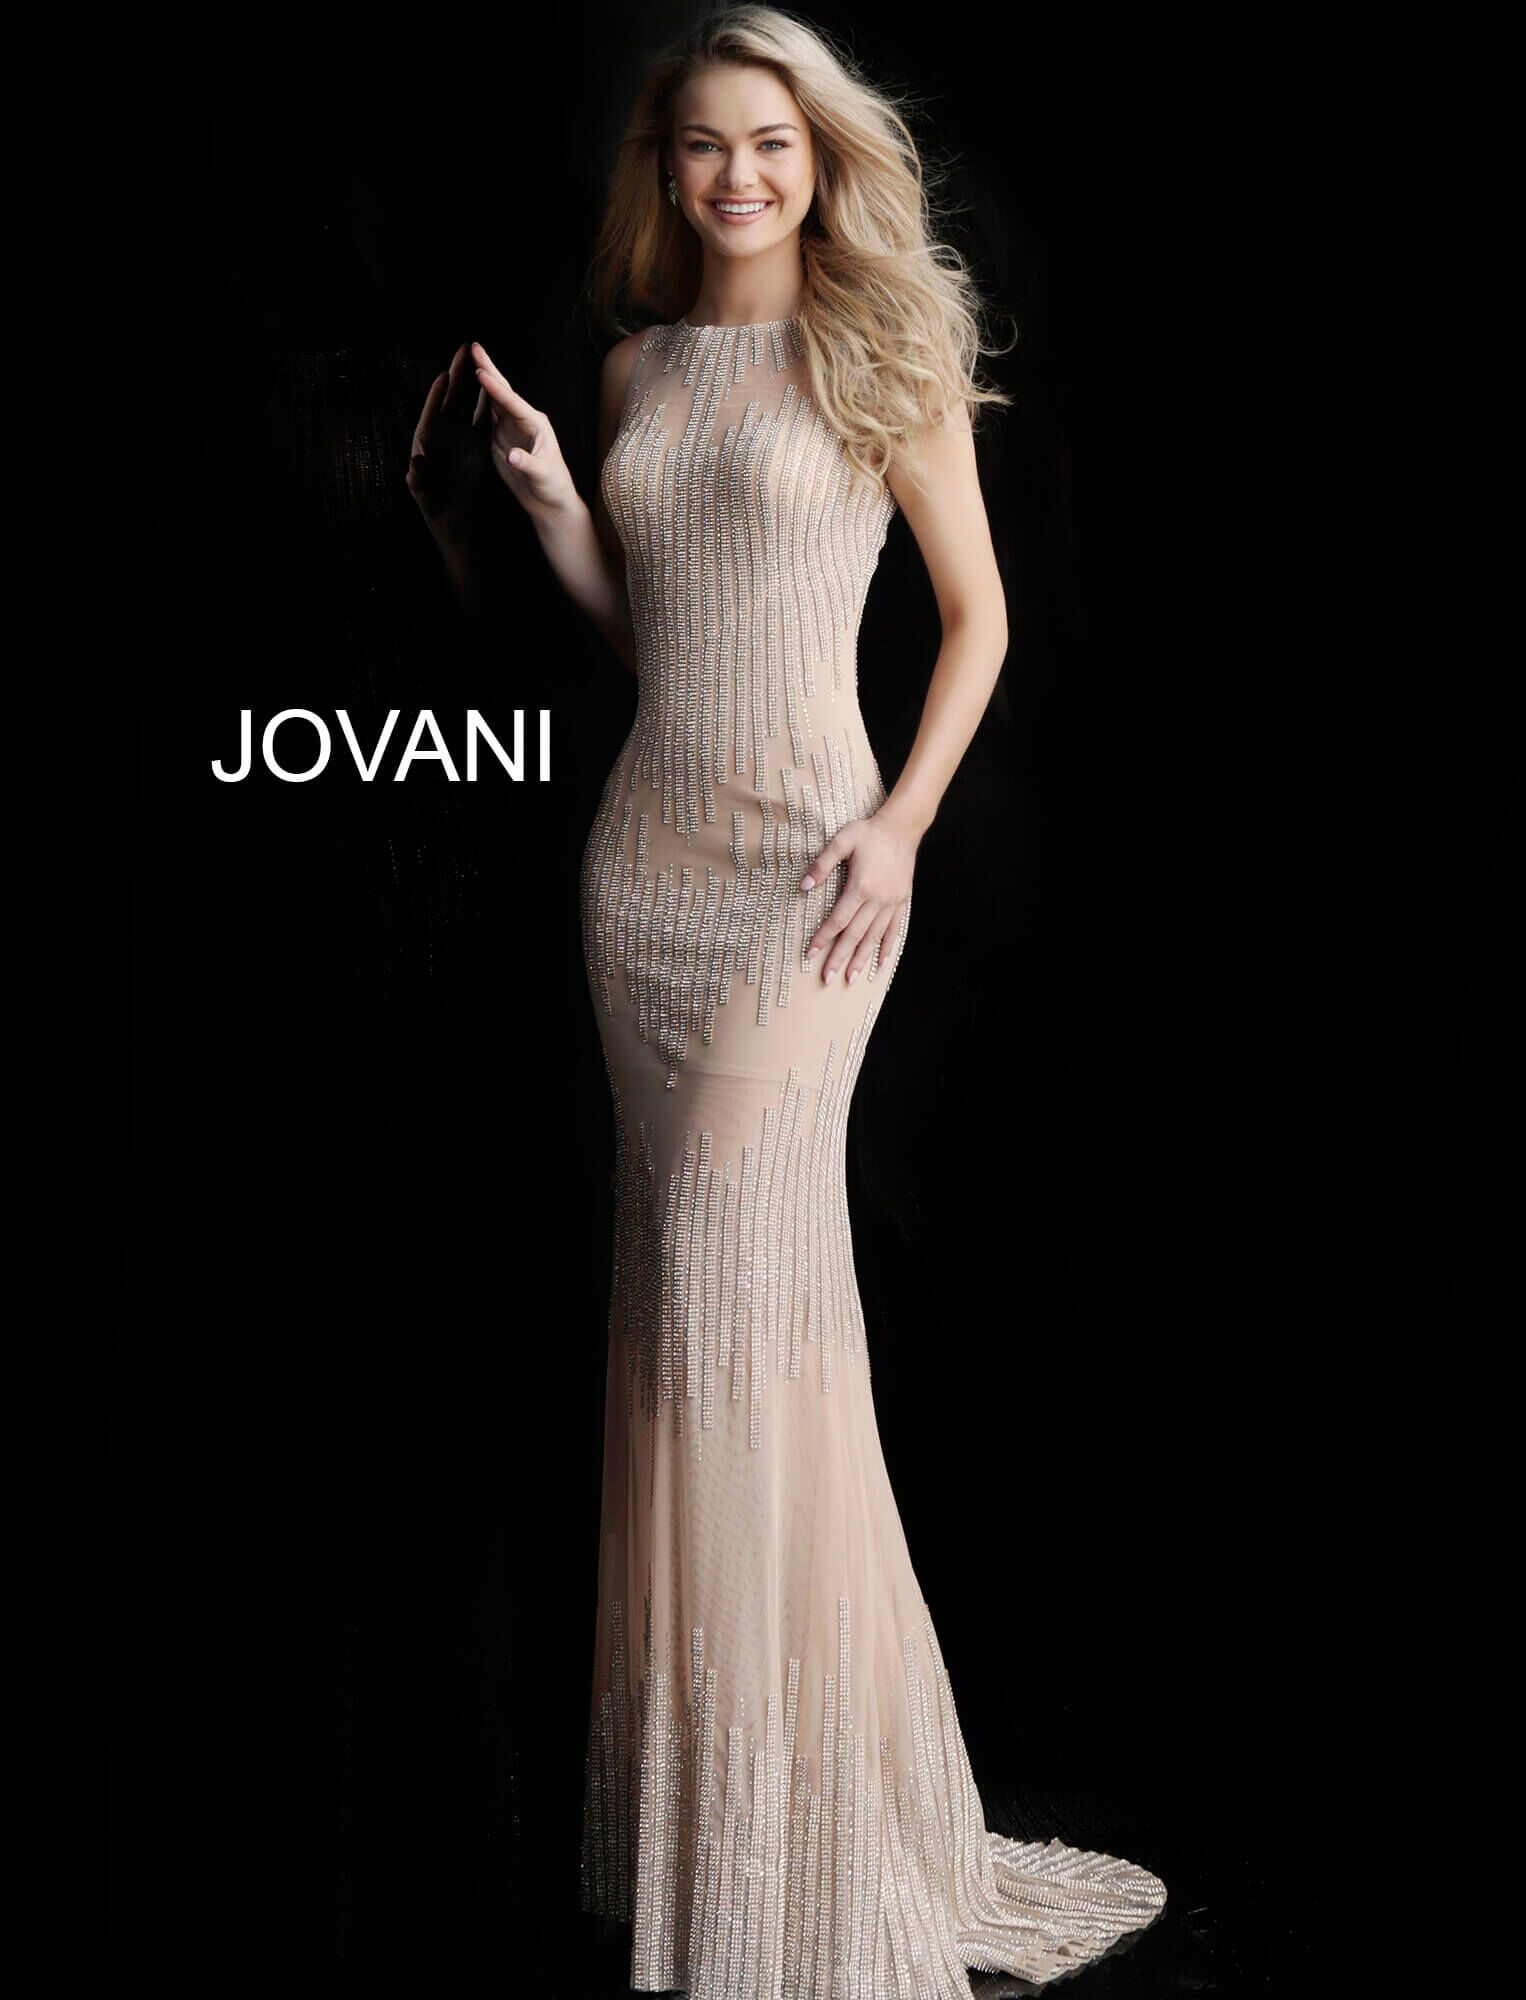 Jovani nude beaded maxi dress